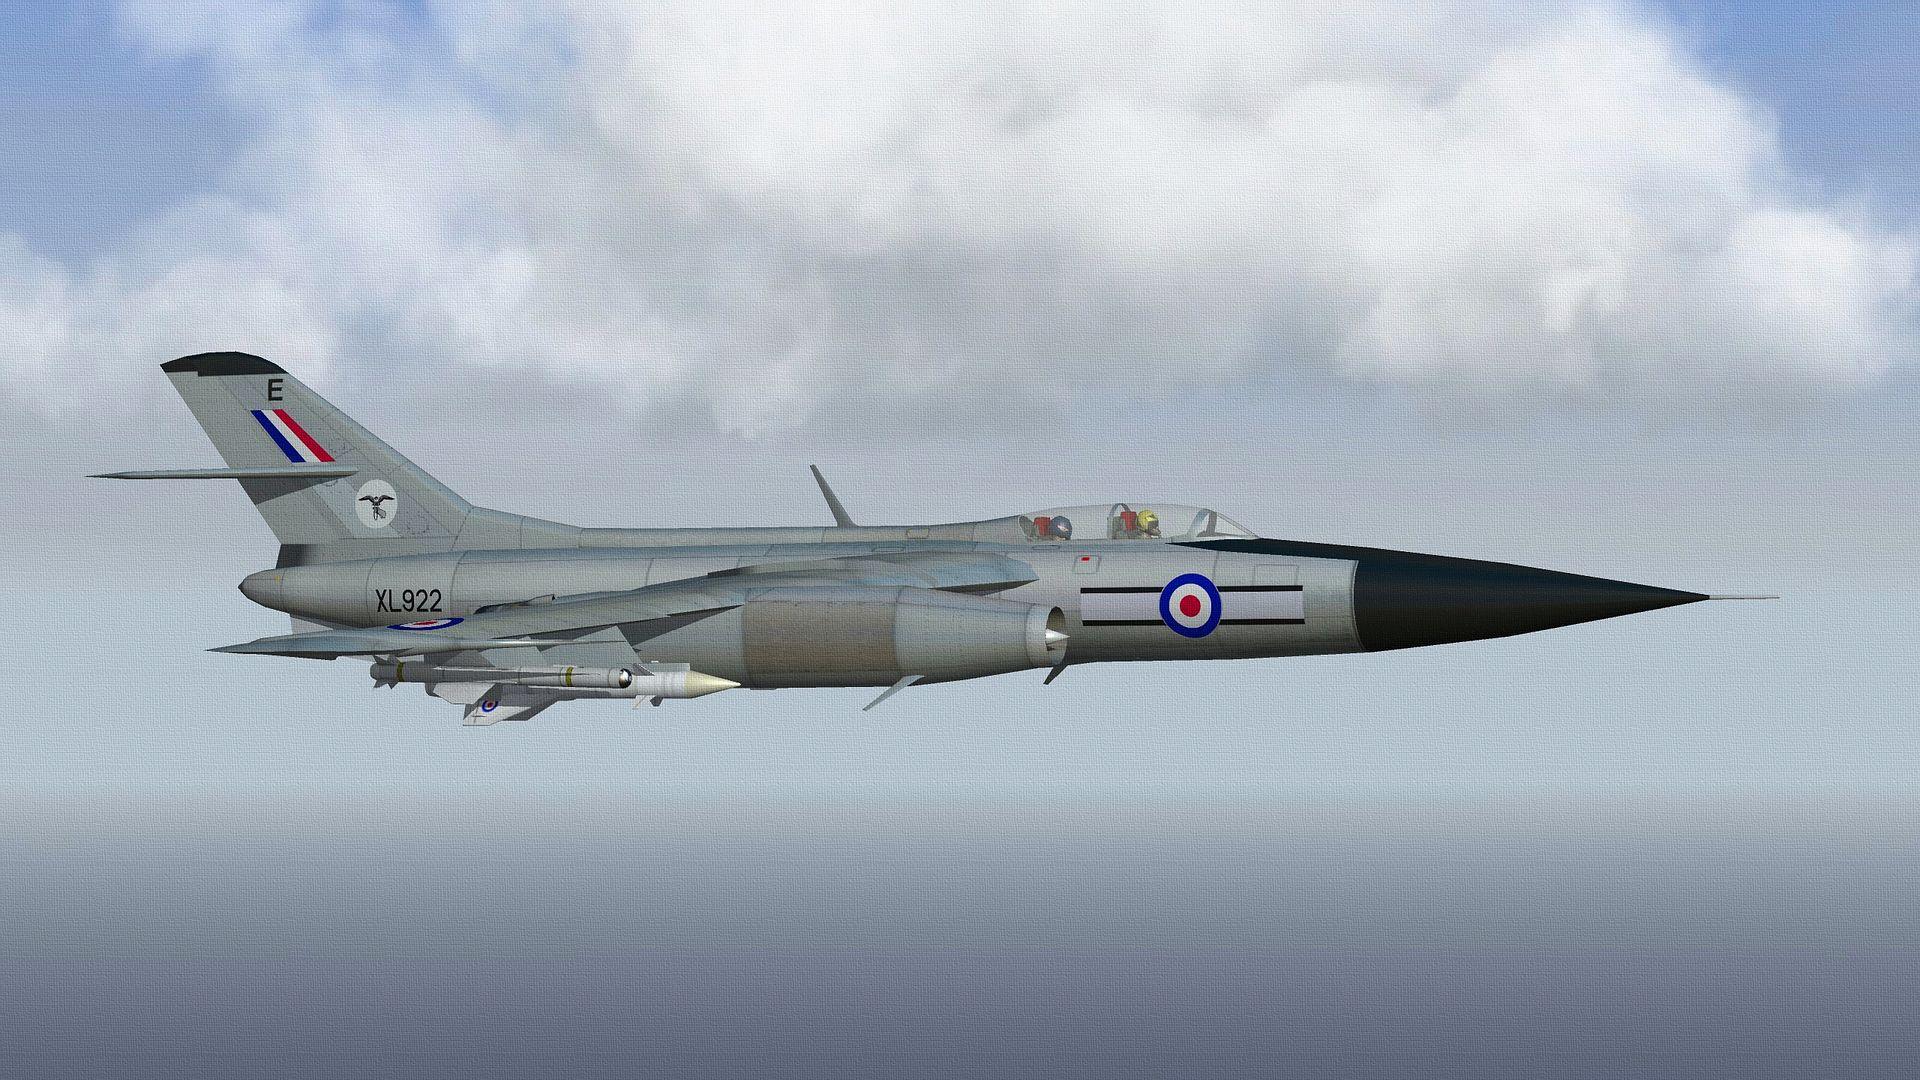 RAF%20FIREBAR%20FAW2.03_zpskcfmvlbw.jpg